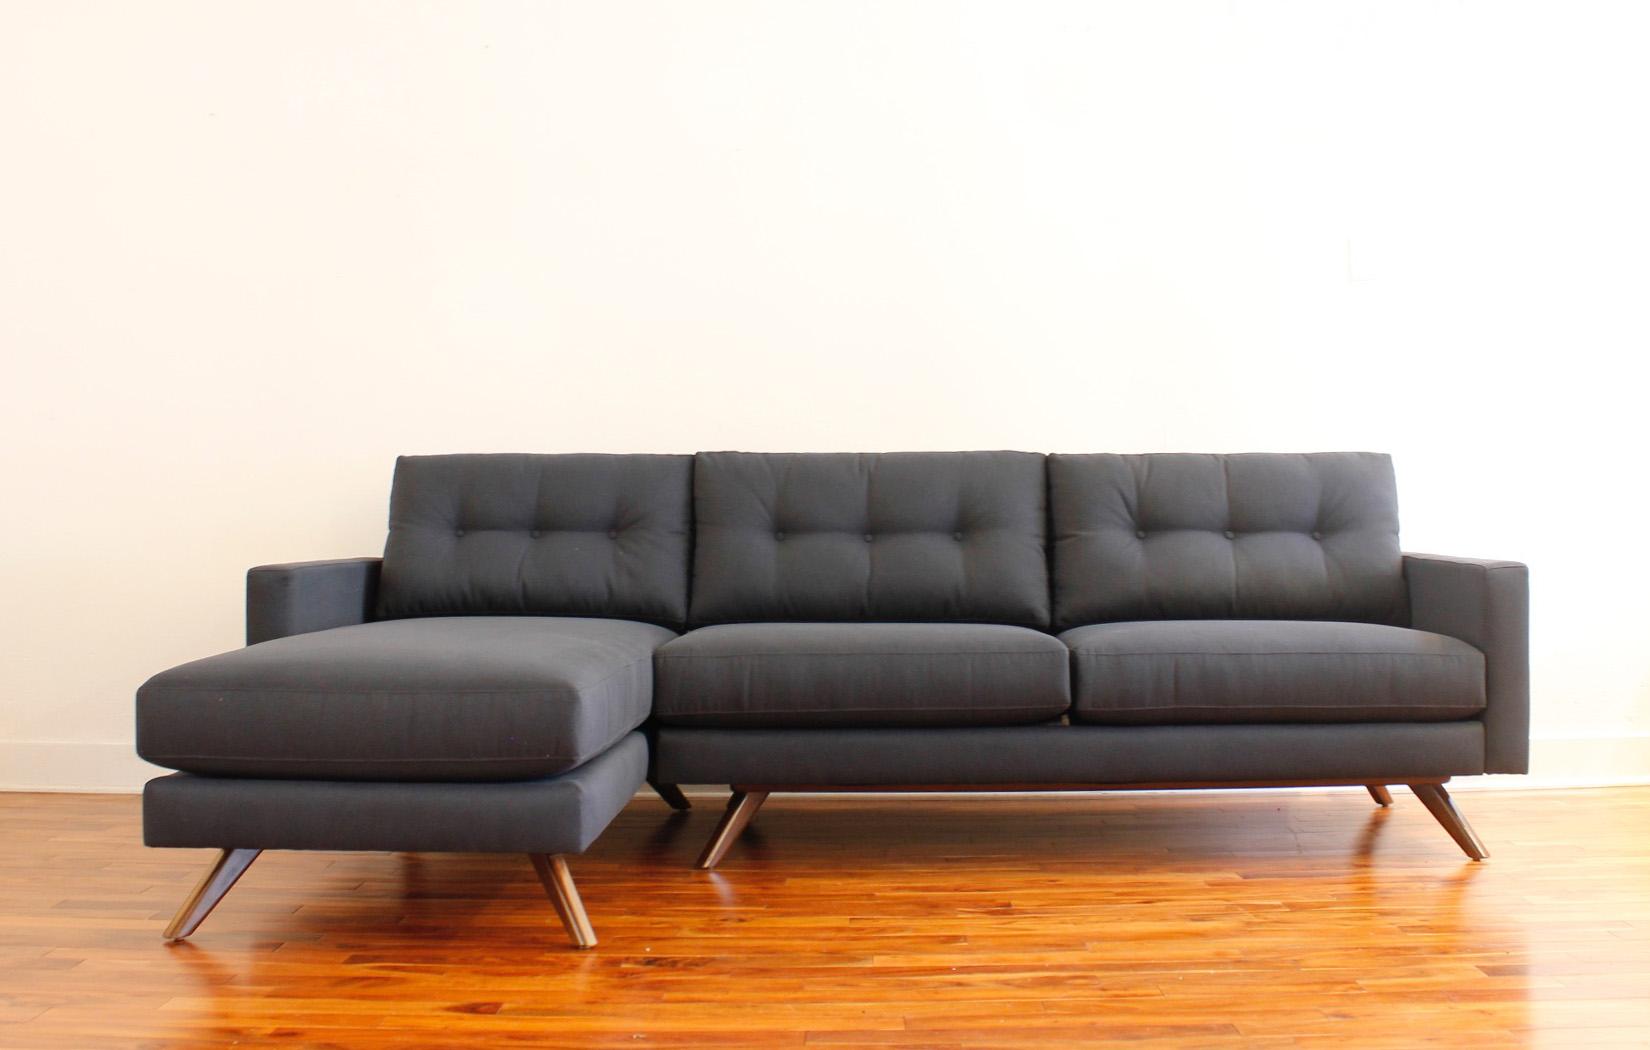 The Oslo Sofa-chaise